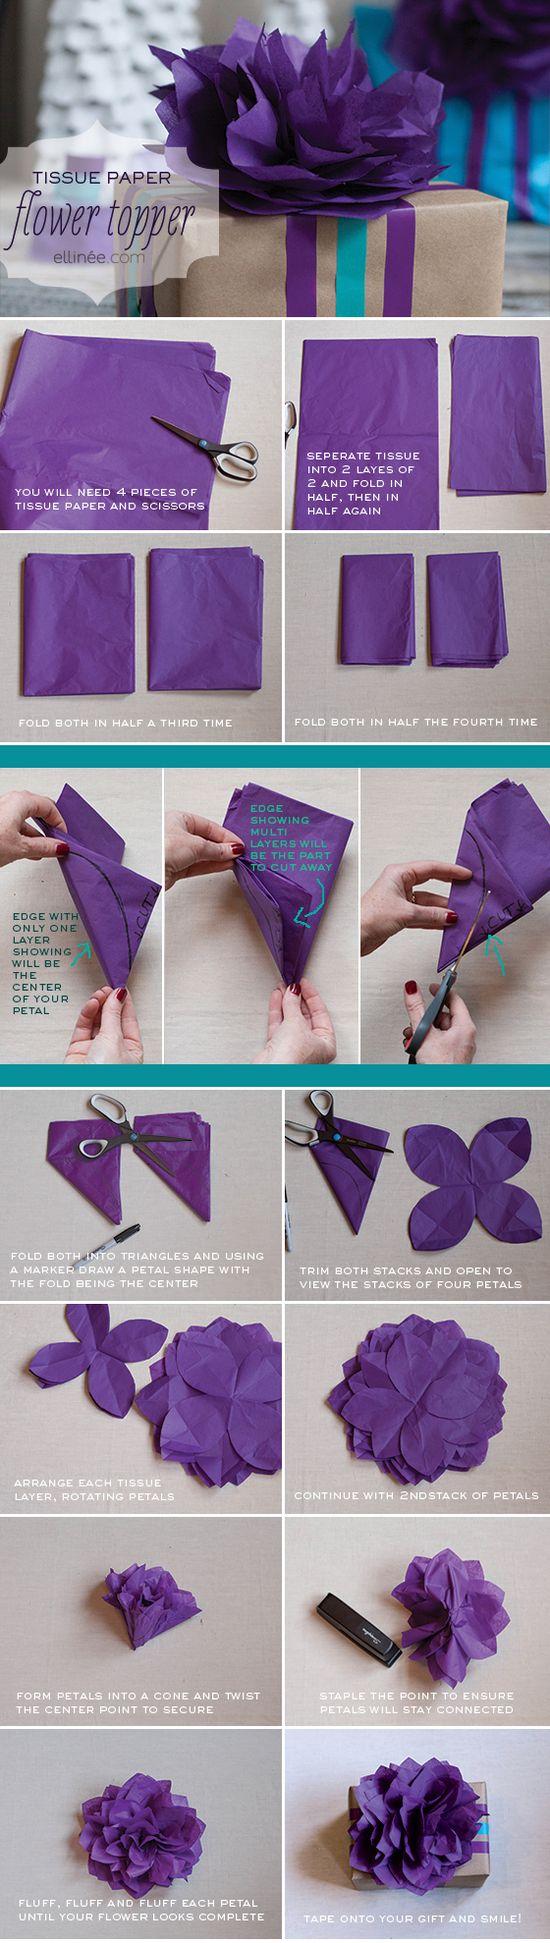 DIY Tissue Paper Flower, Gift Wrap Topper, Tutorial, DIY – flowers garland,Cool